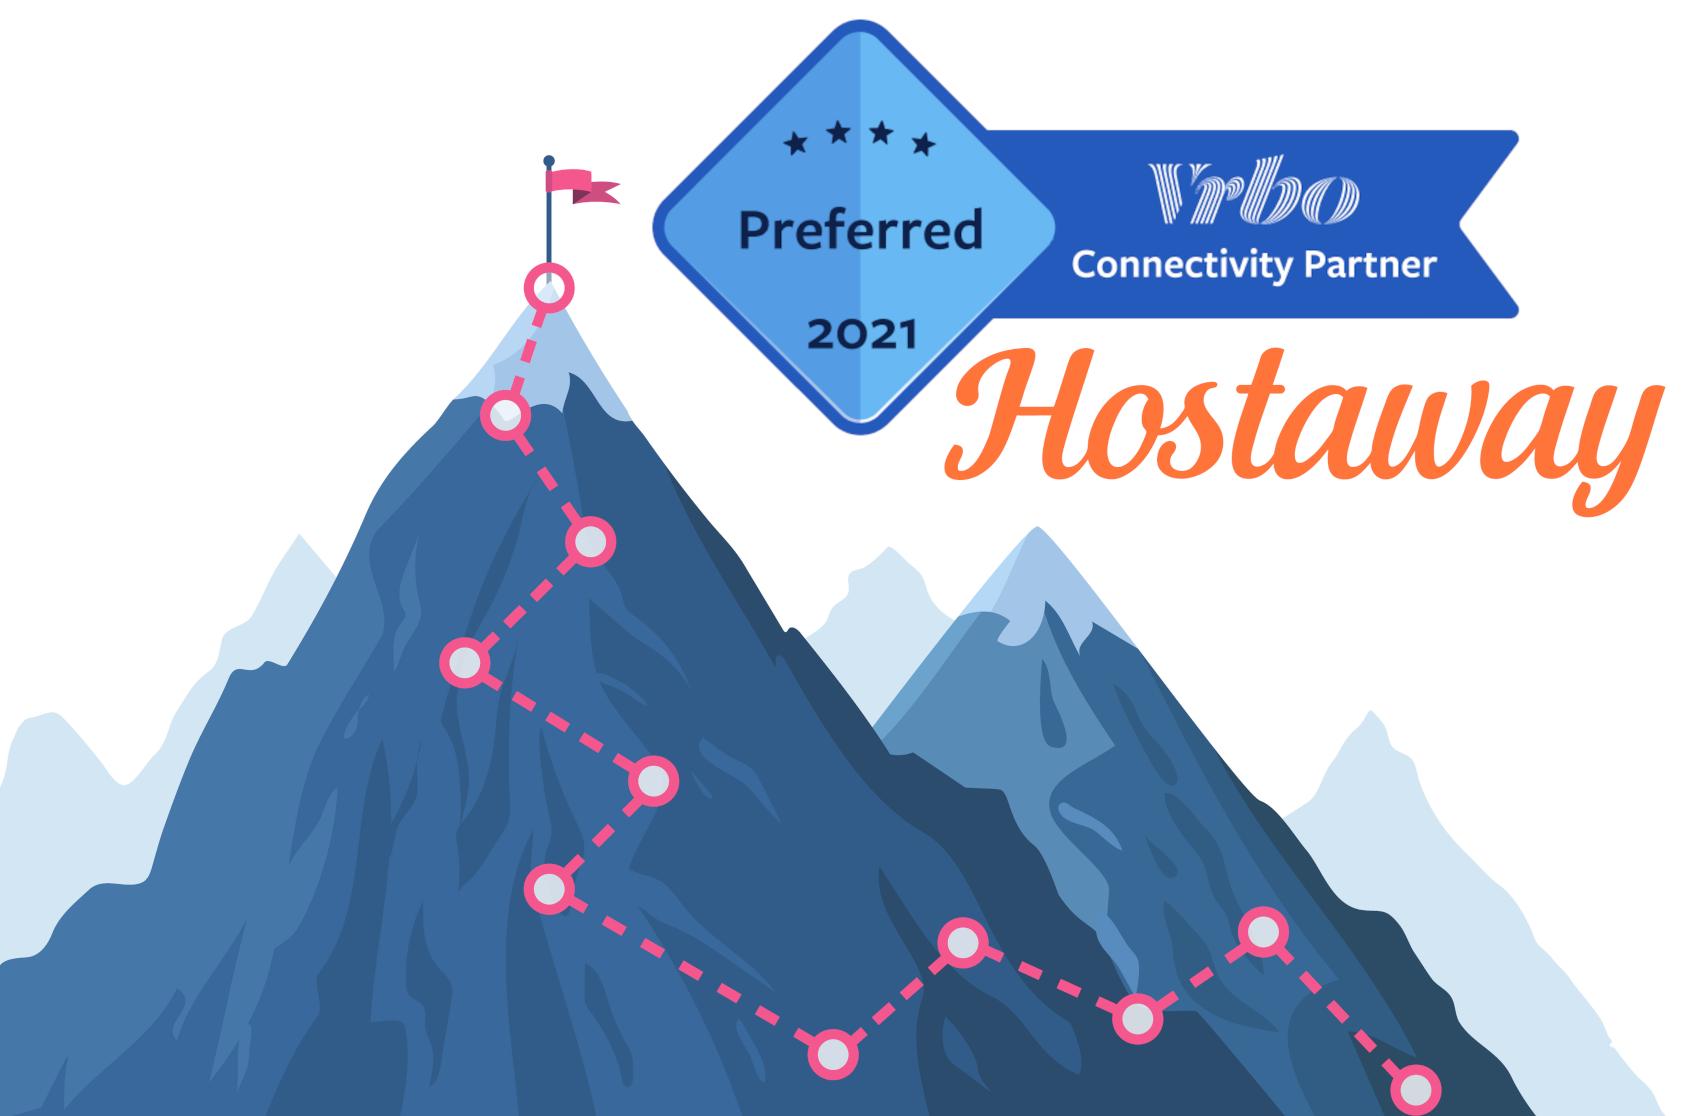 vrbo preferred connectivity partner Hostaway